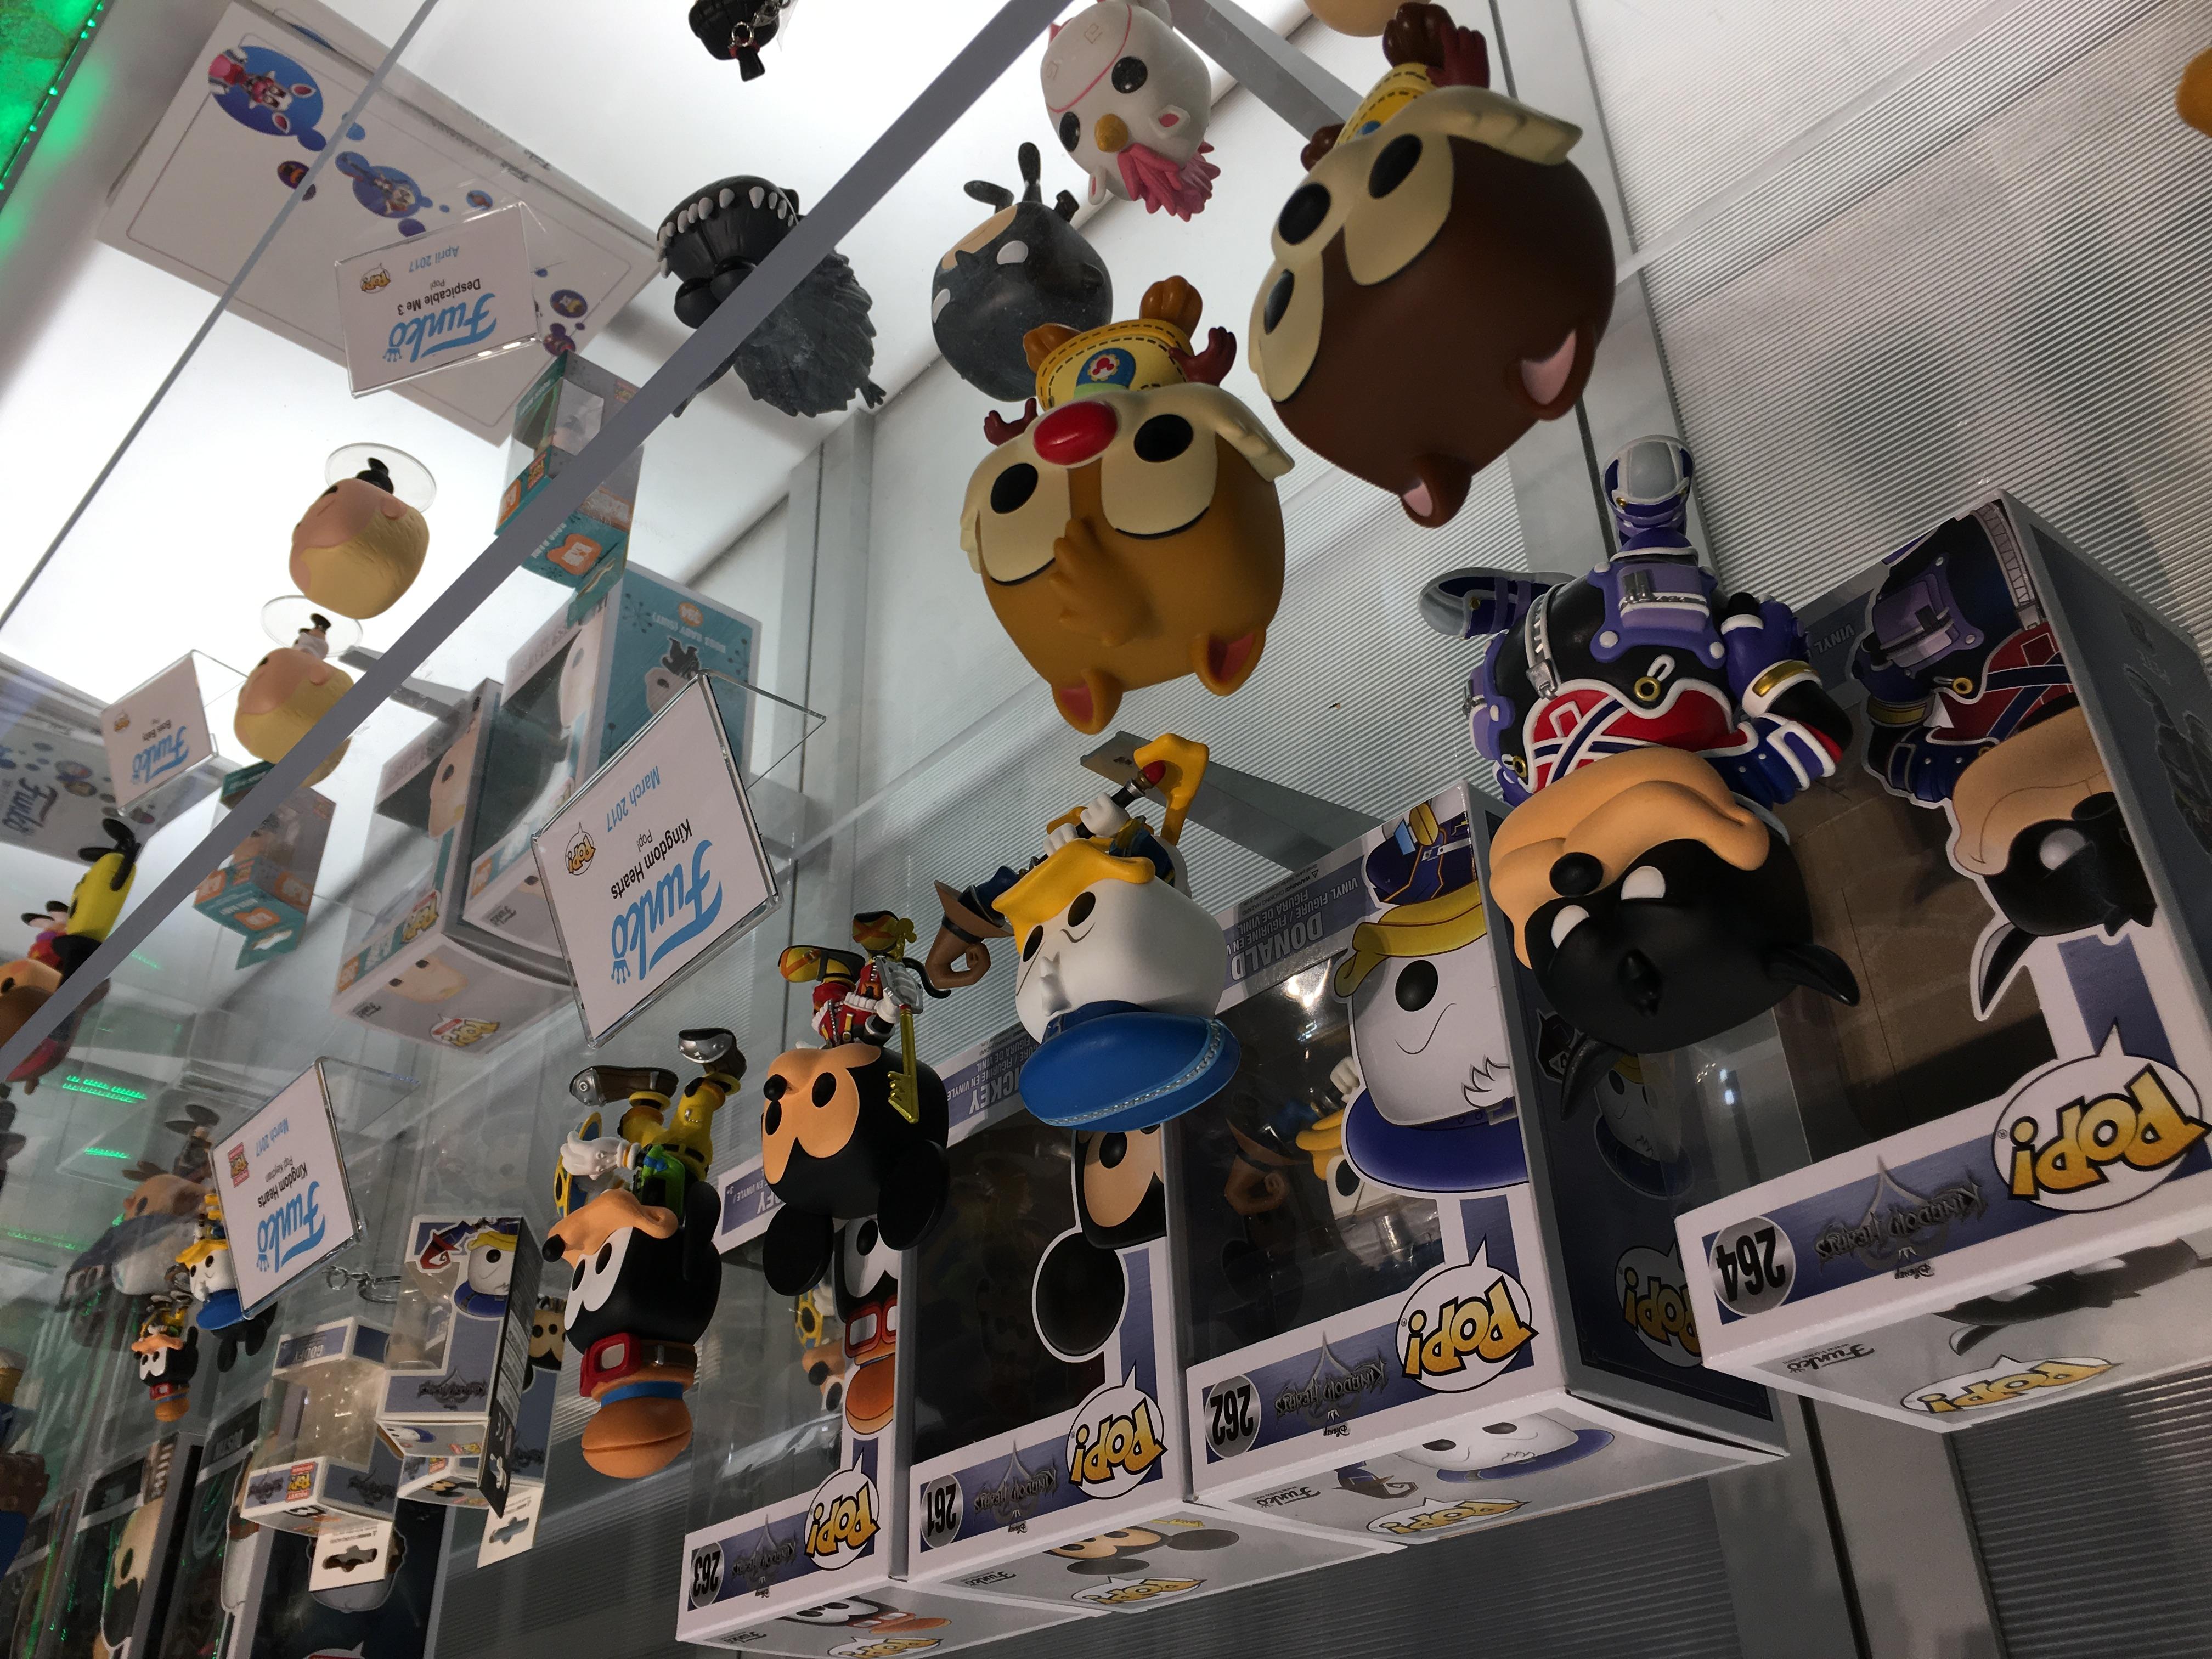 ... Kingdom Hearts Funko Pops and Plushies - News - Kingdom Hearts Insider